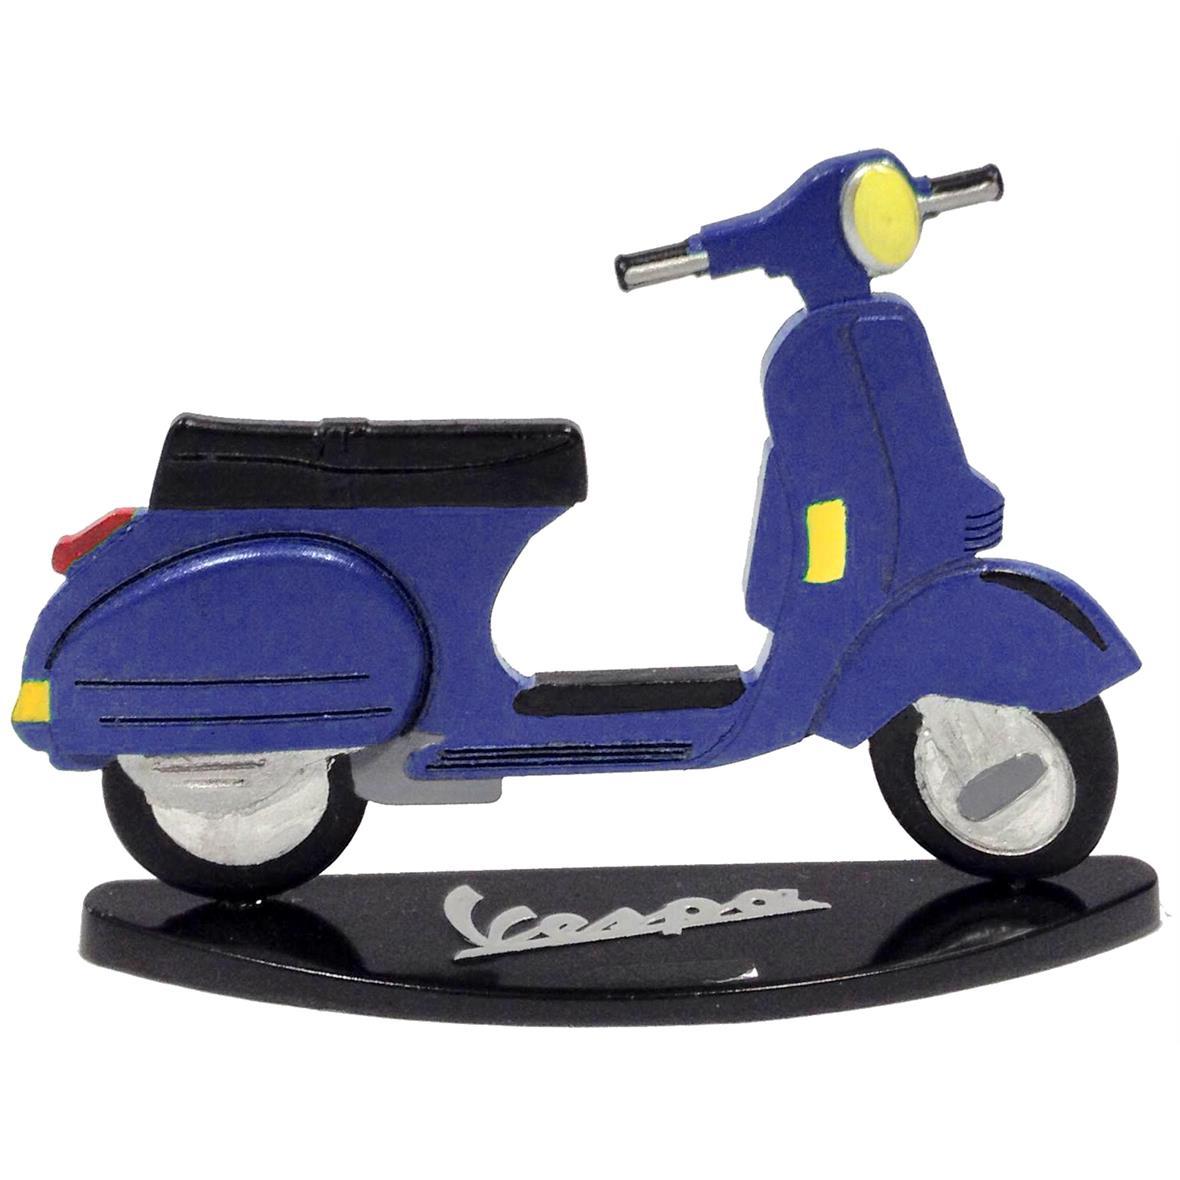 Product Image for 'Model FORME Vespa PXTitle'